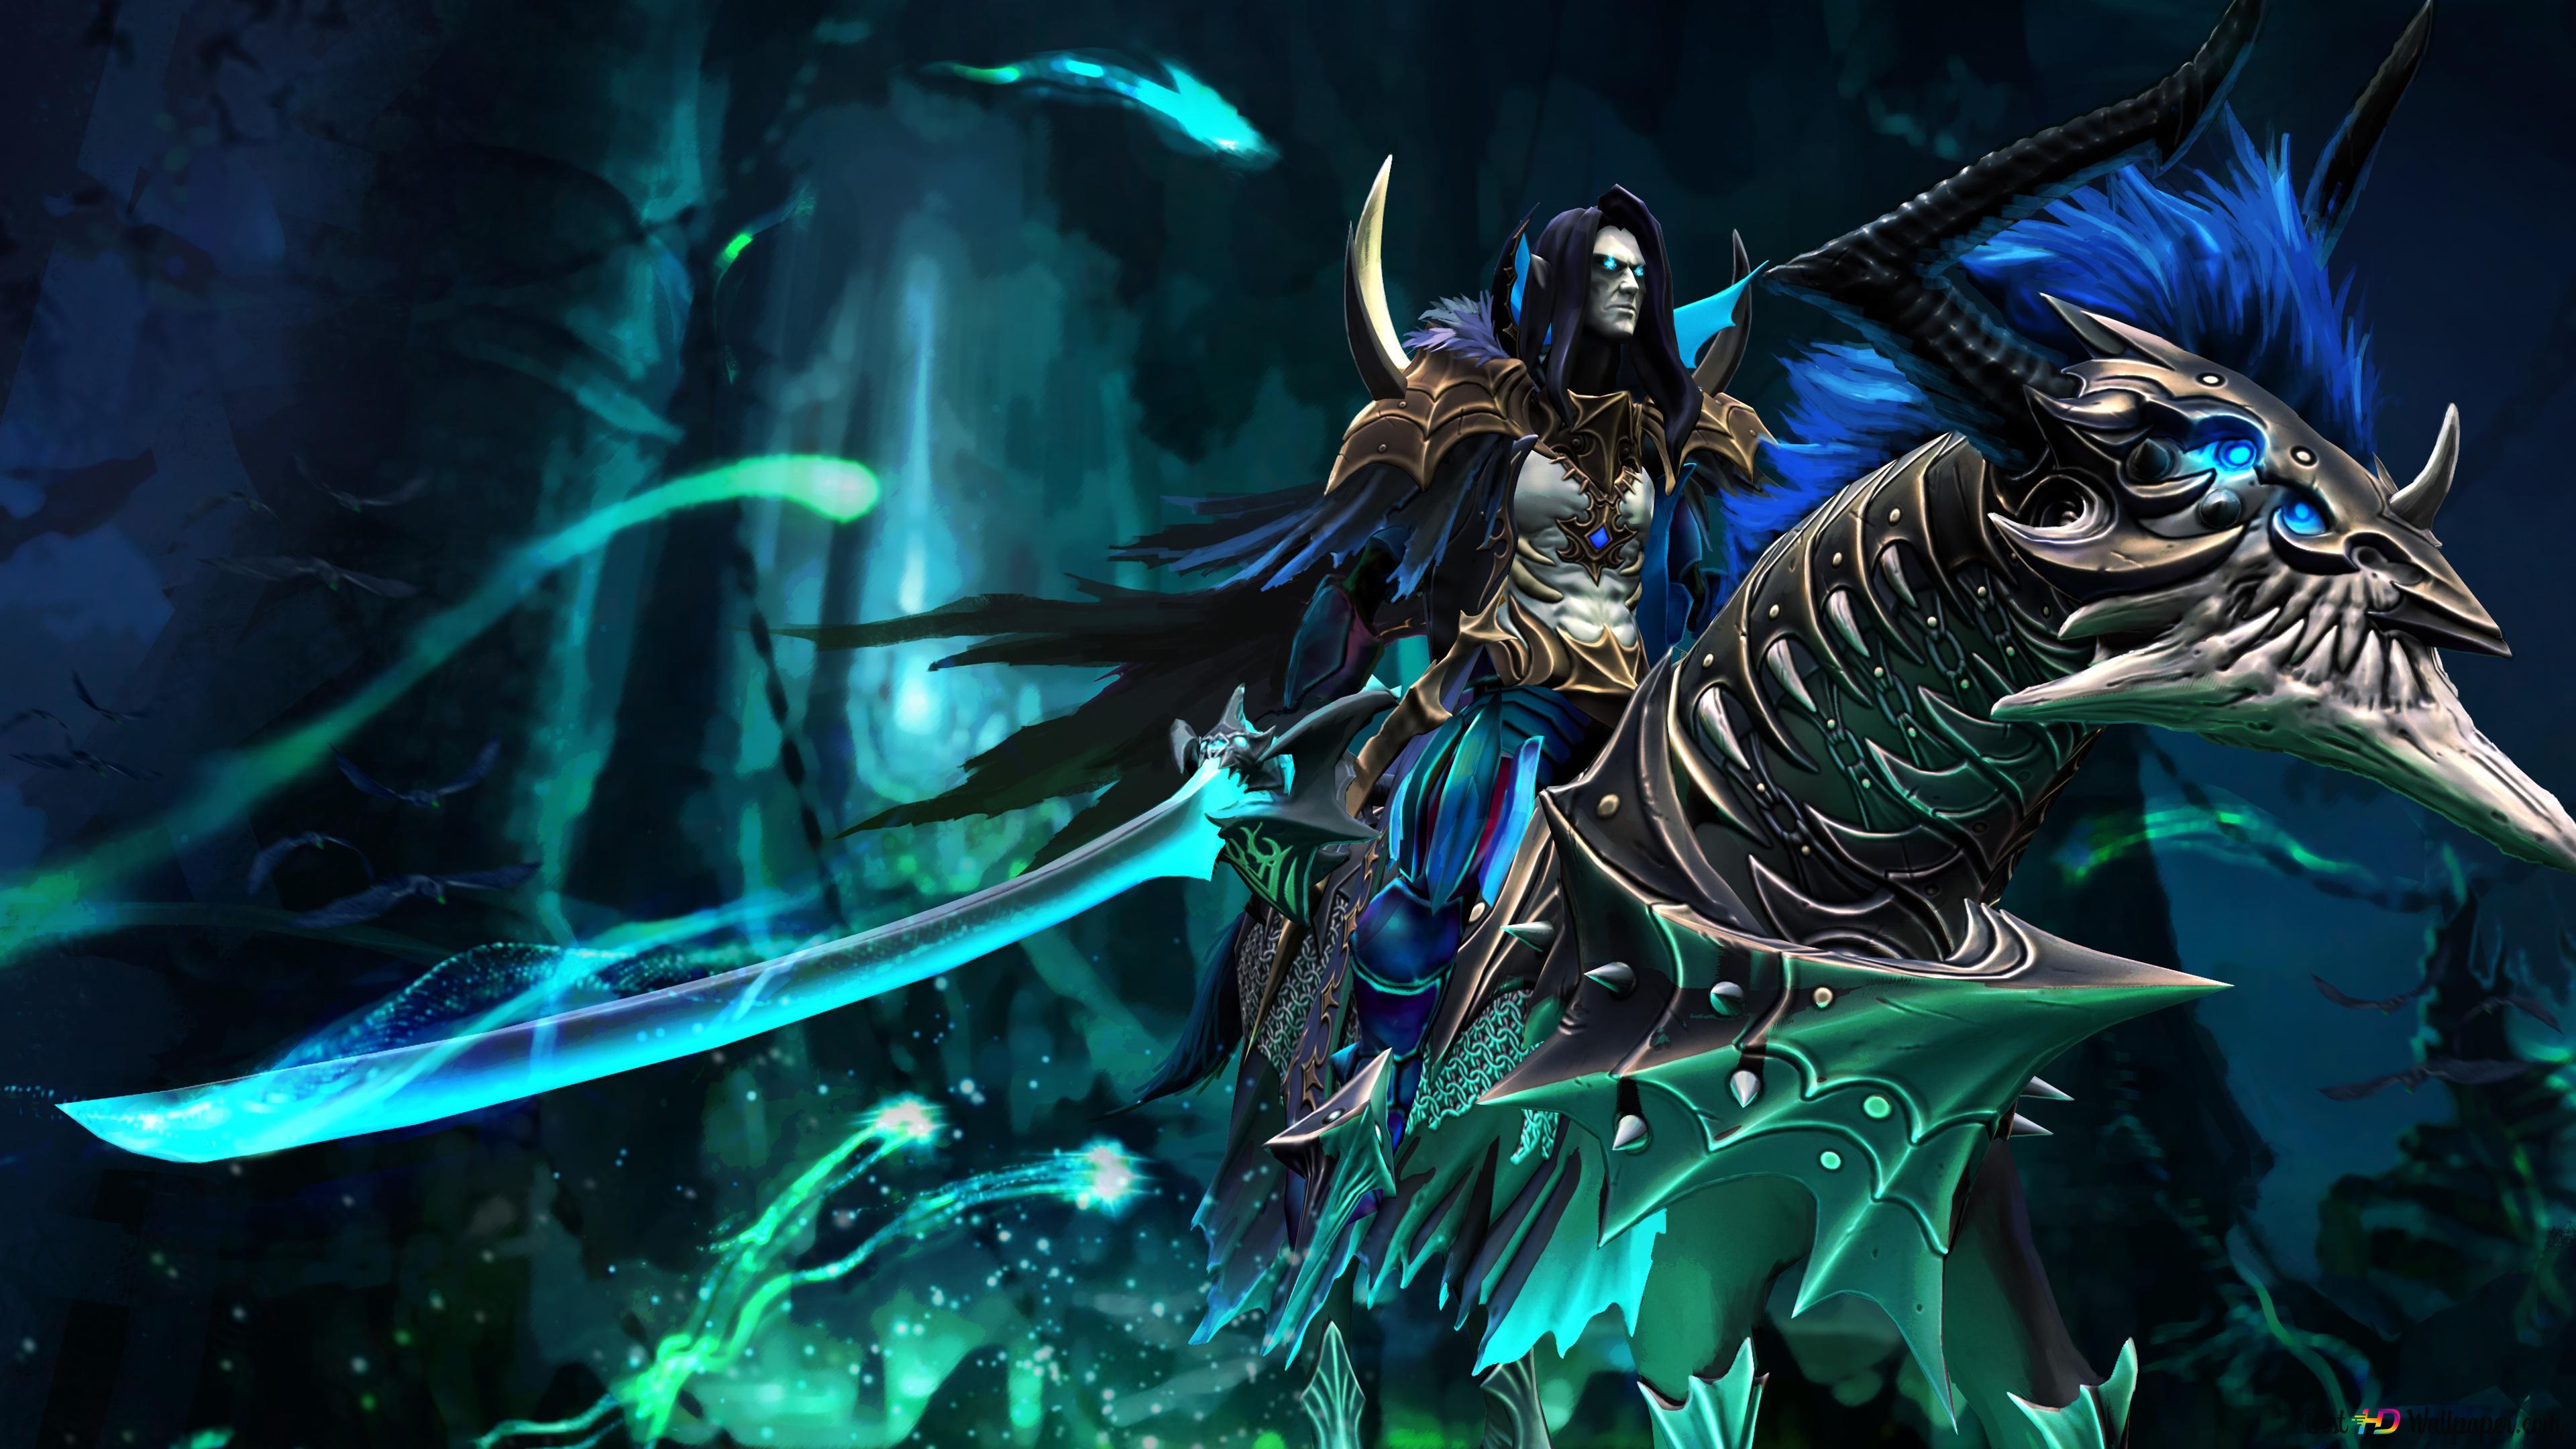 Evil Warrior from DOTA 2 HD wallpaper